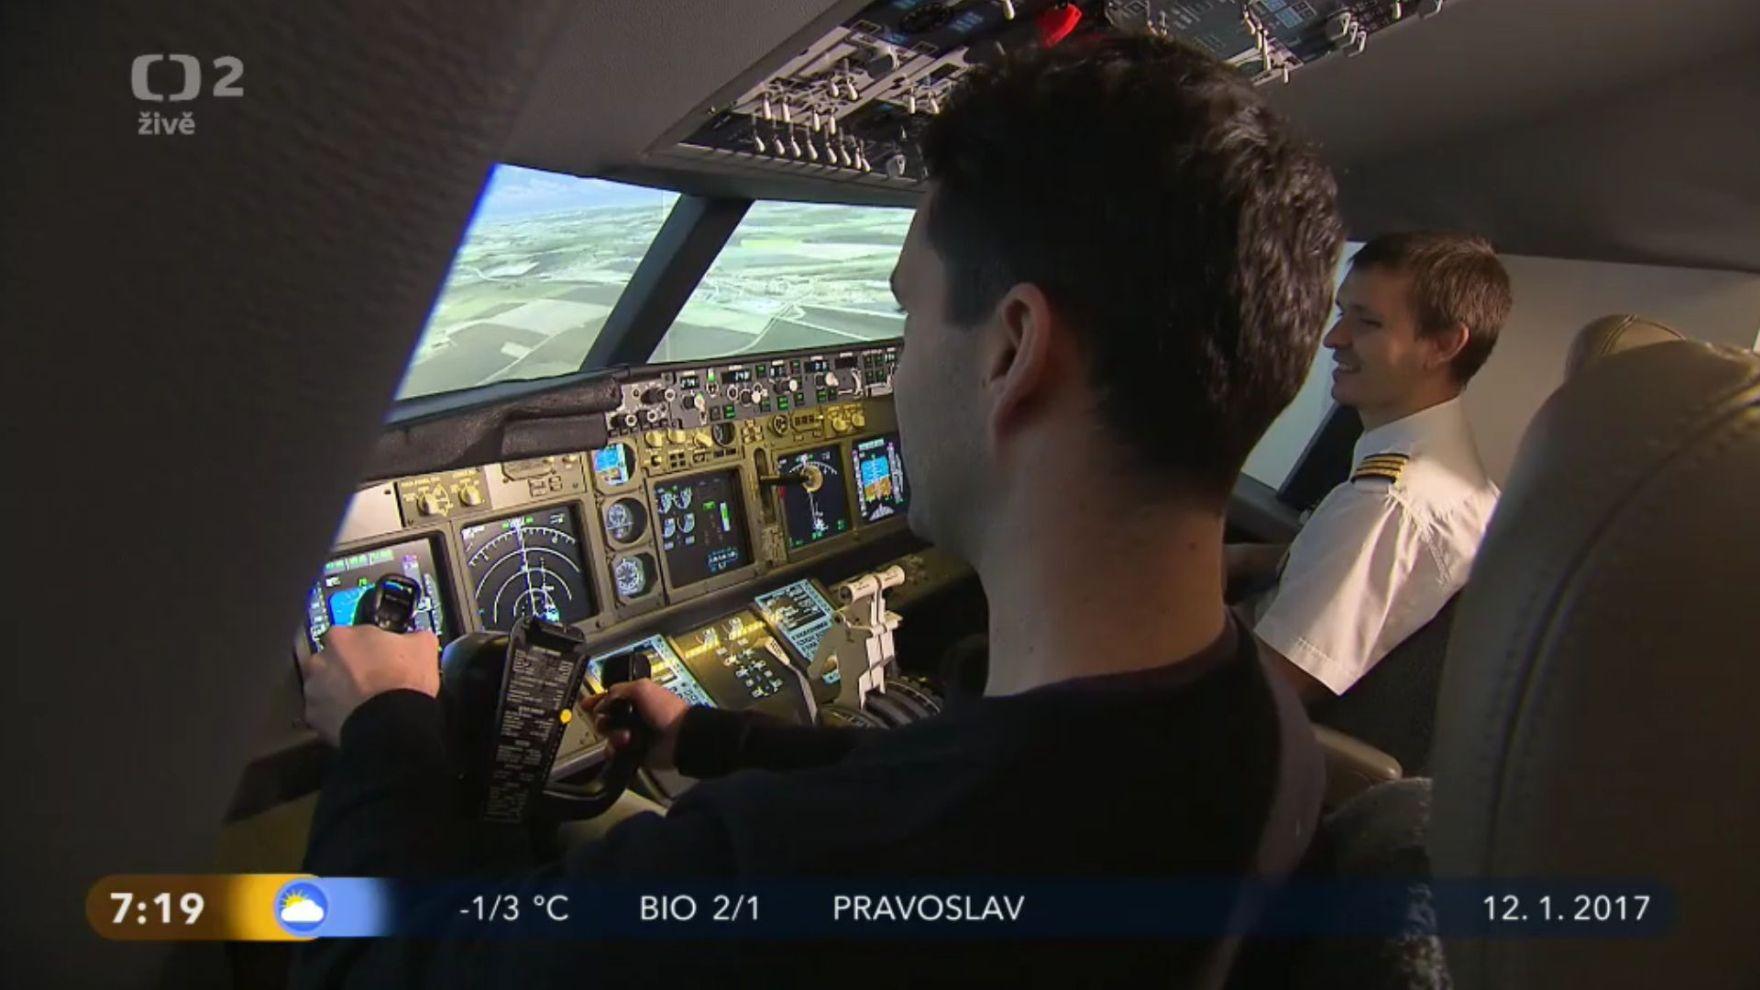 AirWine_ceska televize